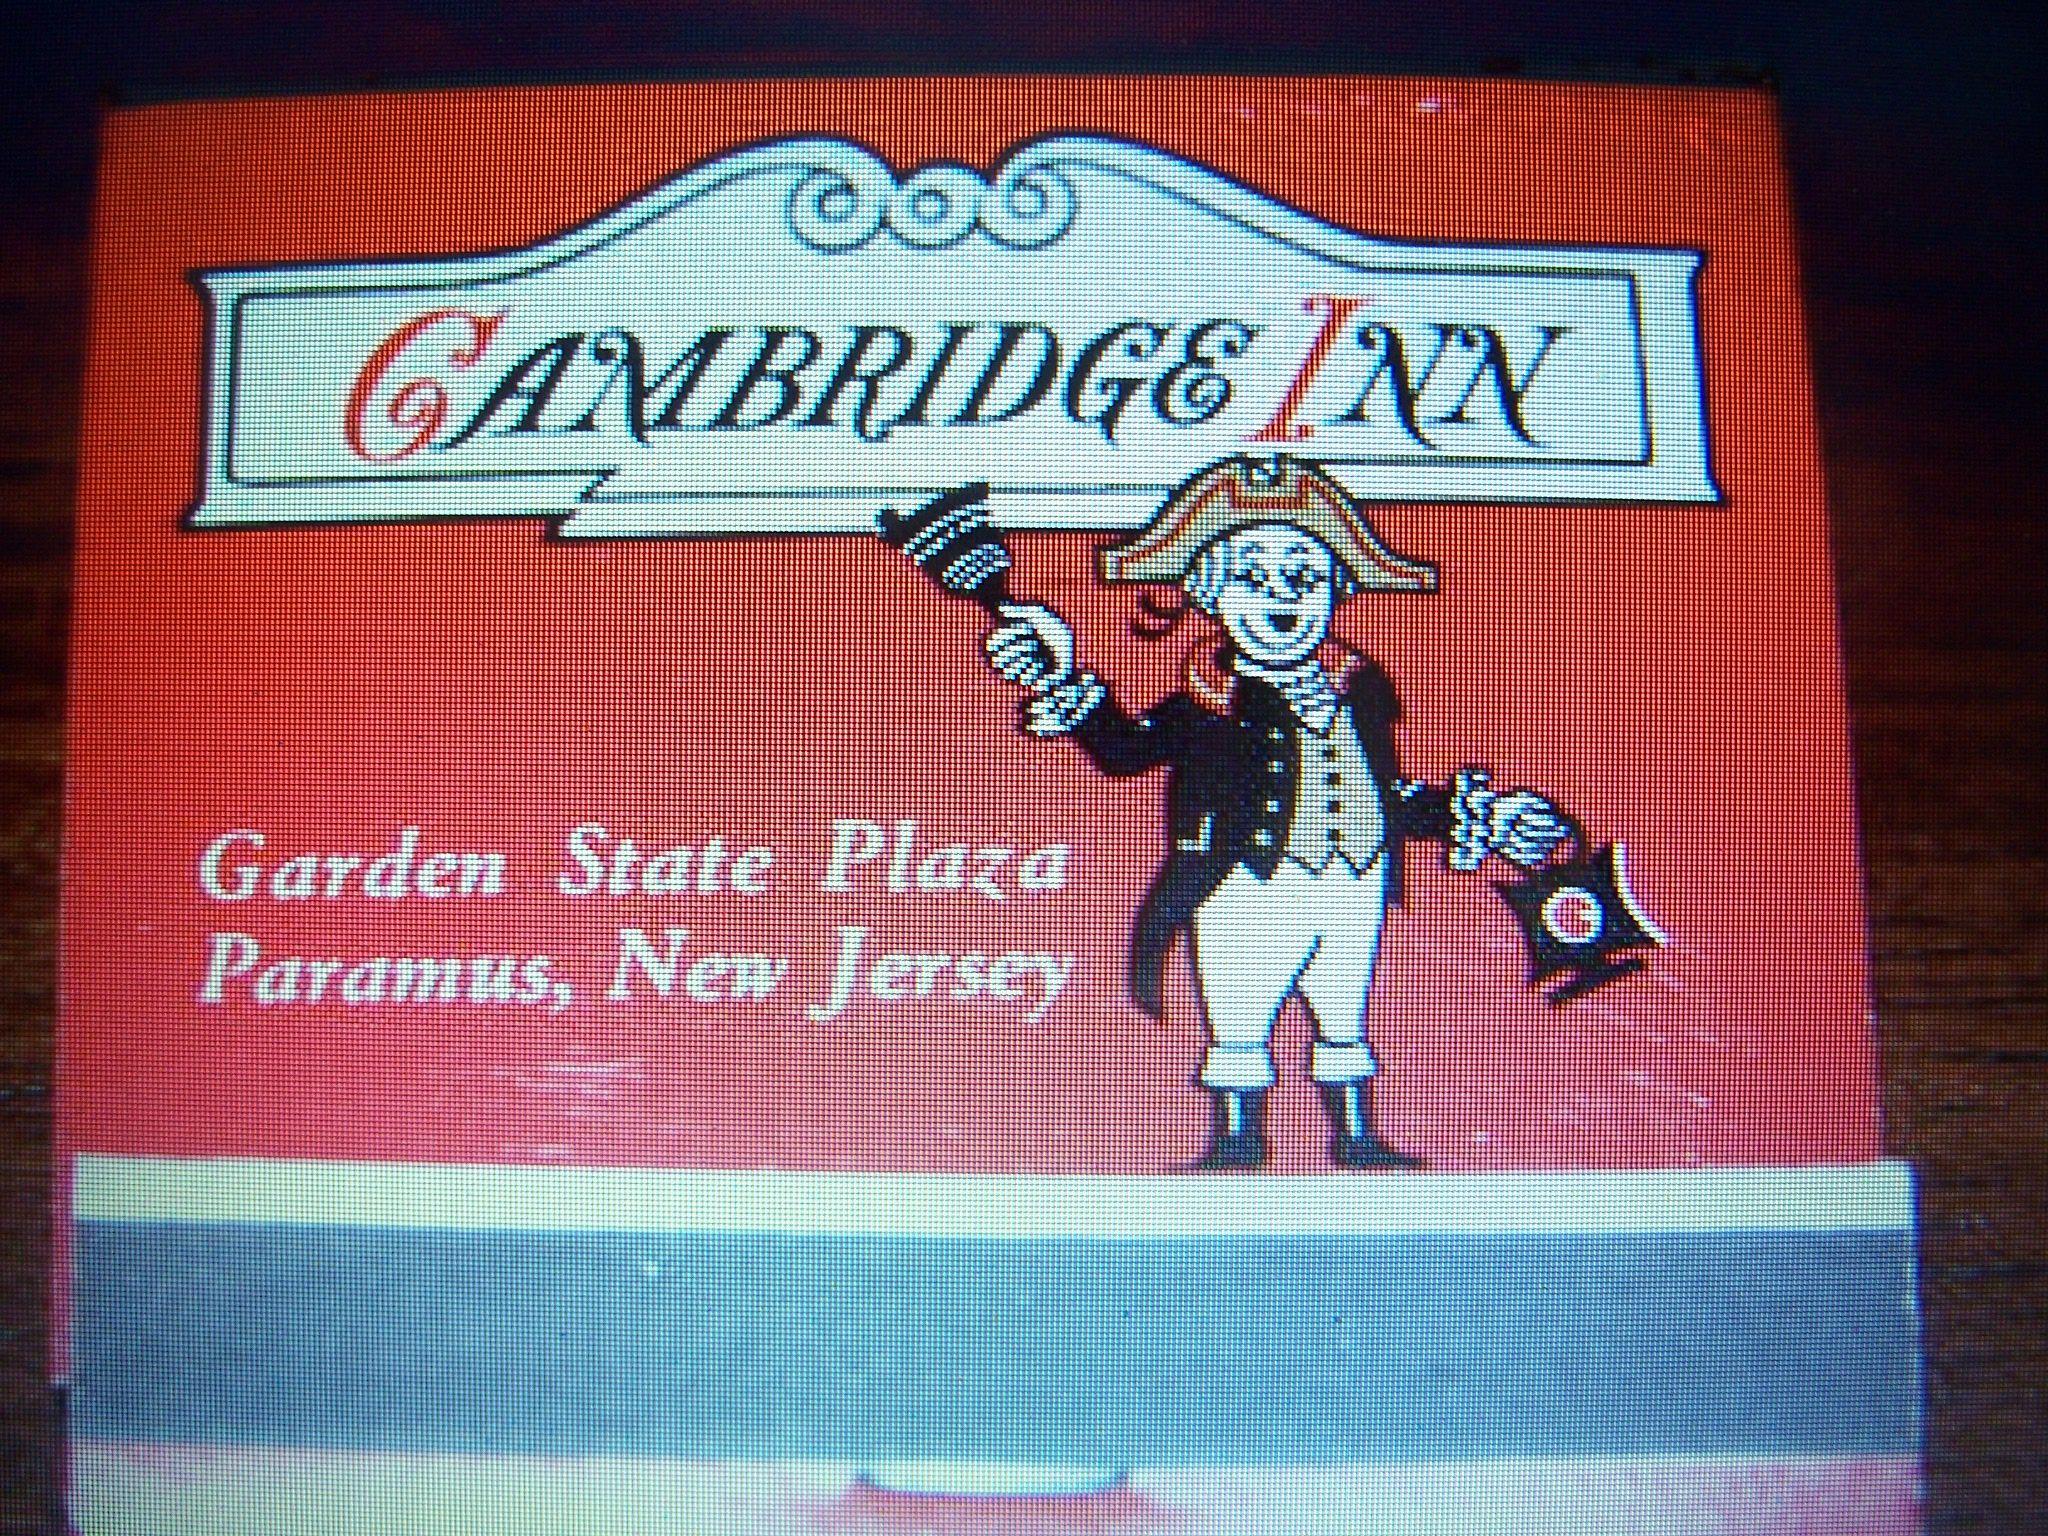 The Cambridge Inn at the Garden State Plaza, Paramus